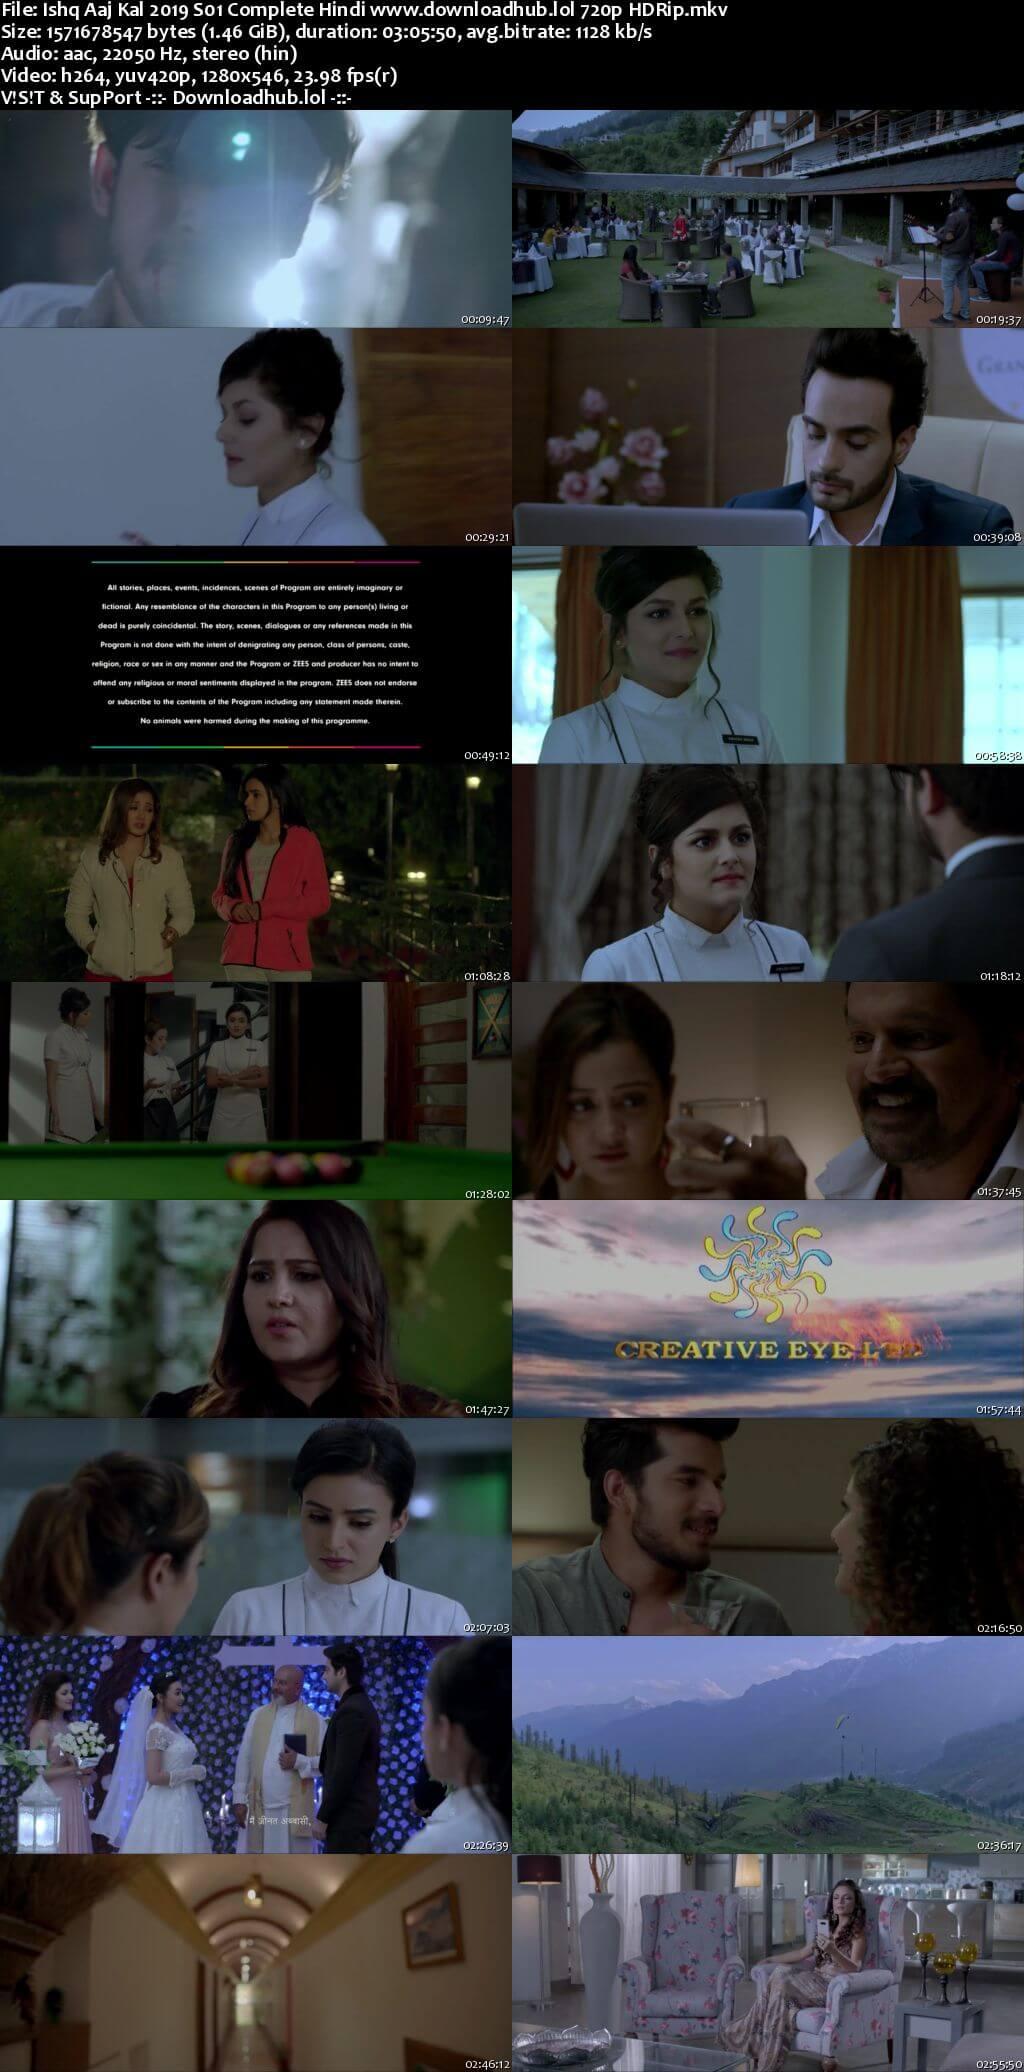 Ishq Aaj Kal 2019 Hindi Season 1 Complete Episodes 720p HDRip